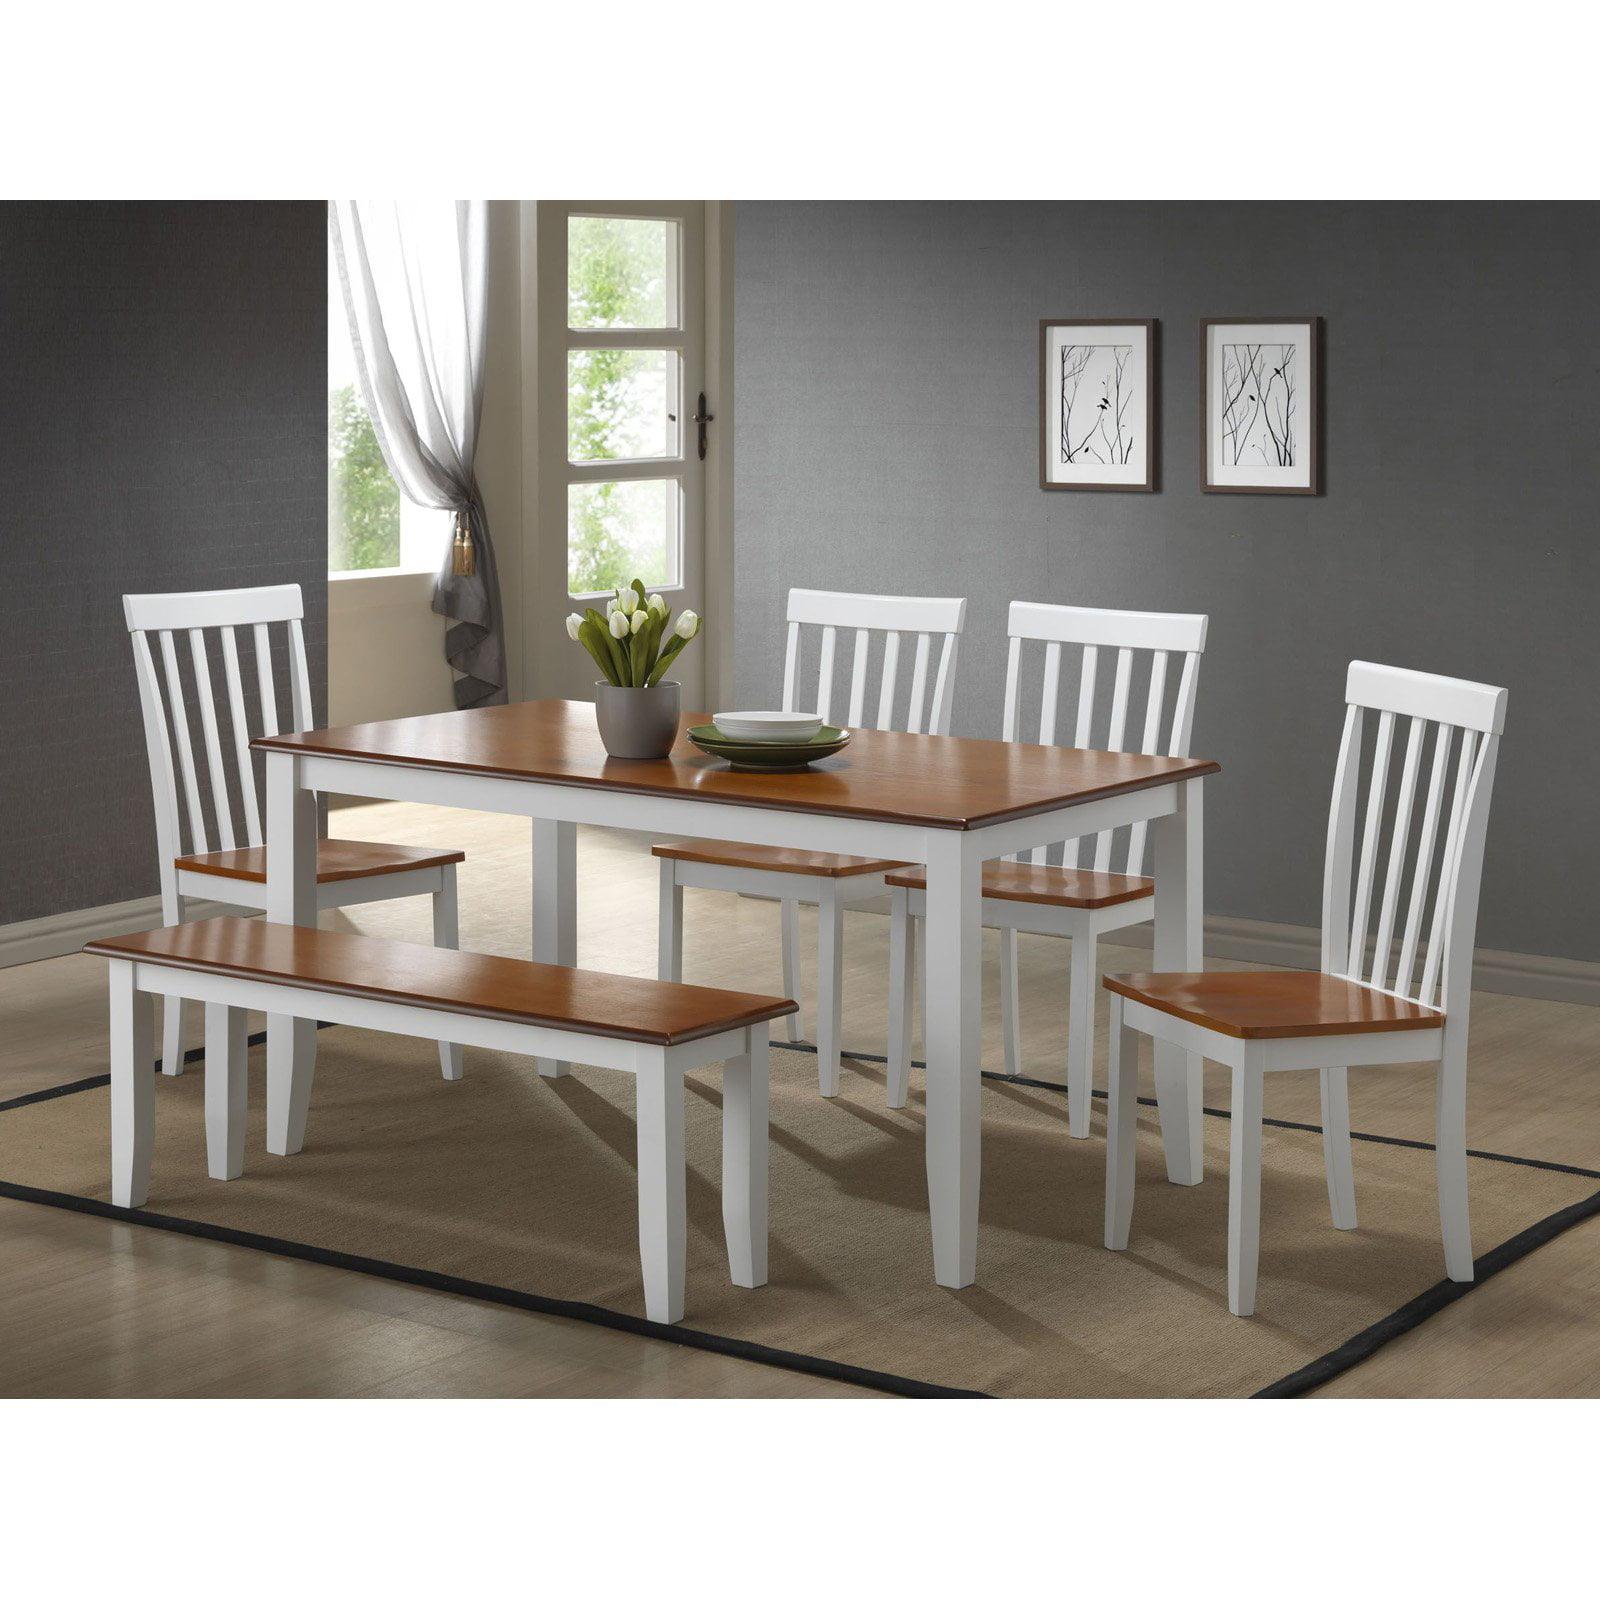 Boraam bloomington 6 piece dining set with bench white honey oak walmart com